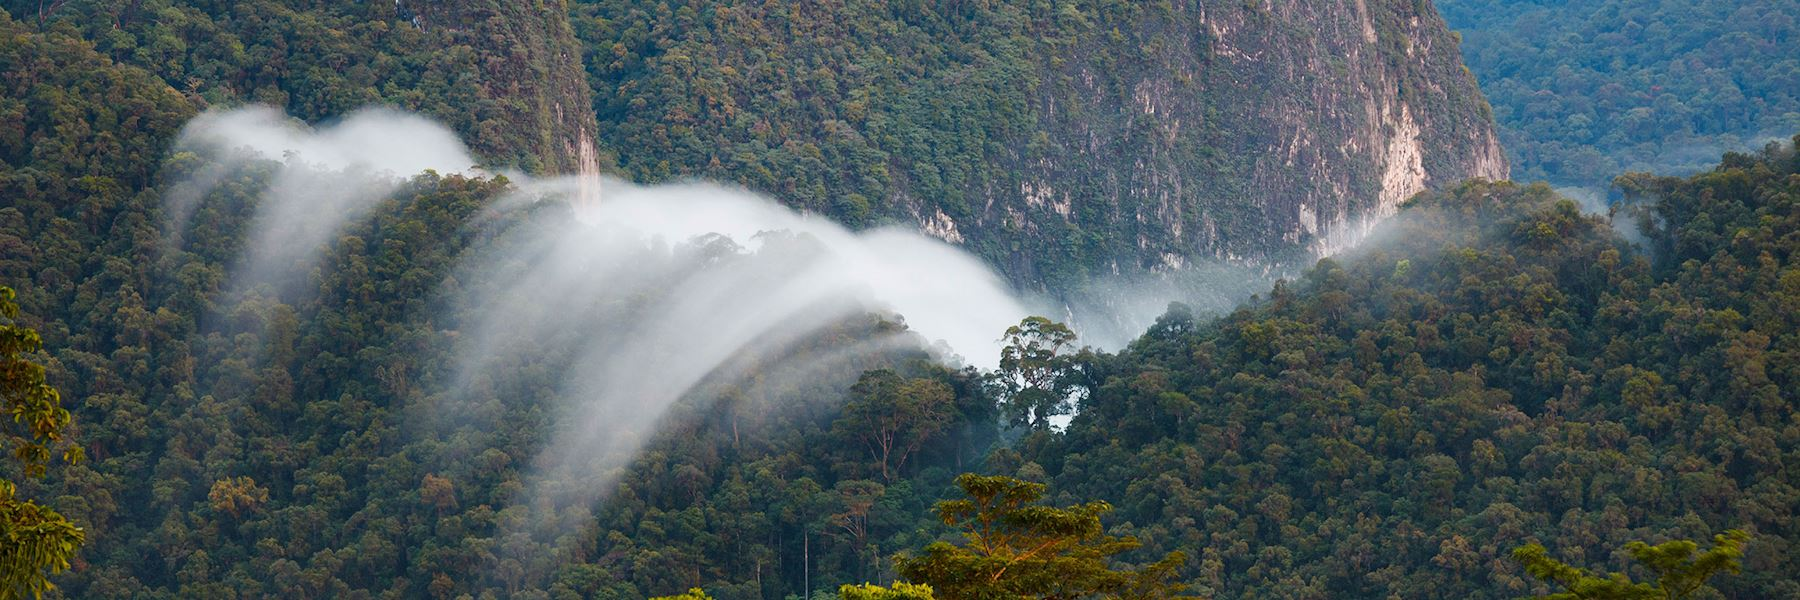 Visit Mulu National Park, Borneo